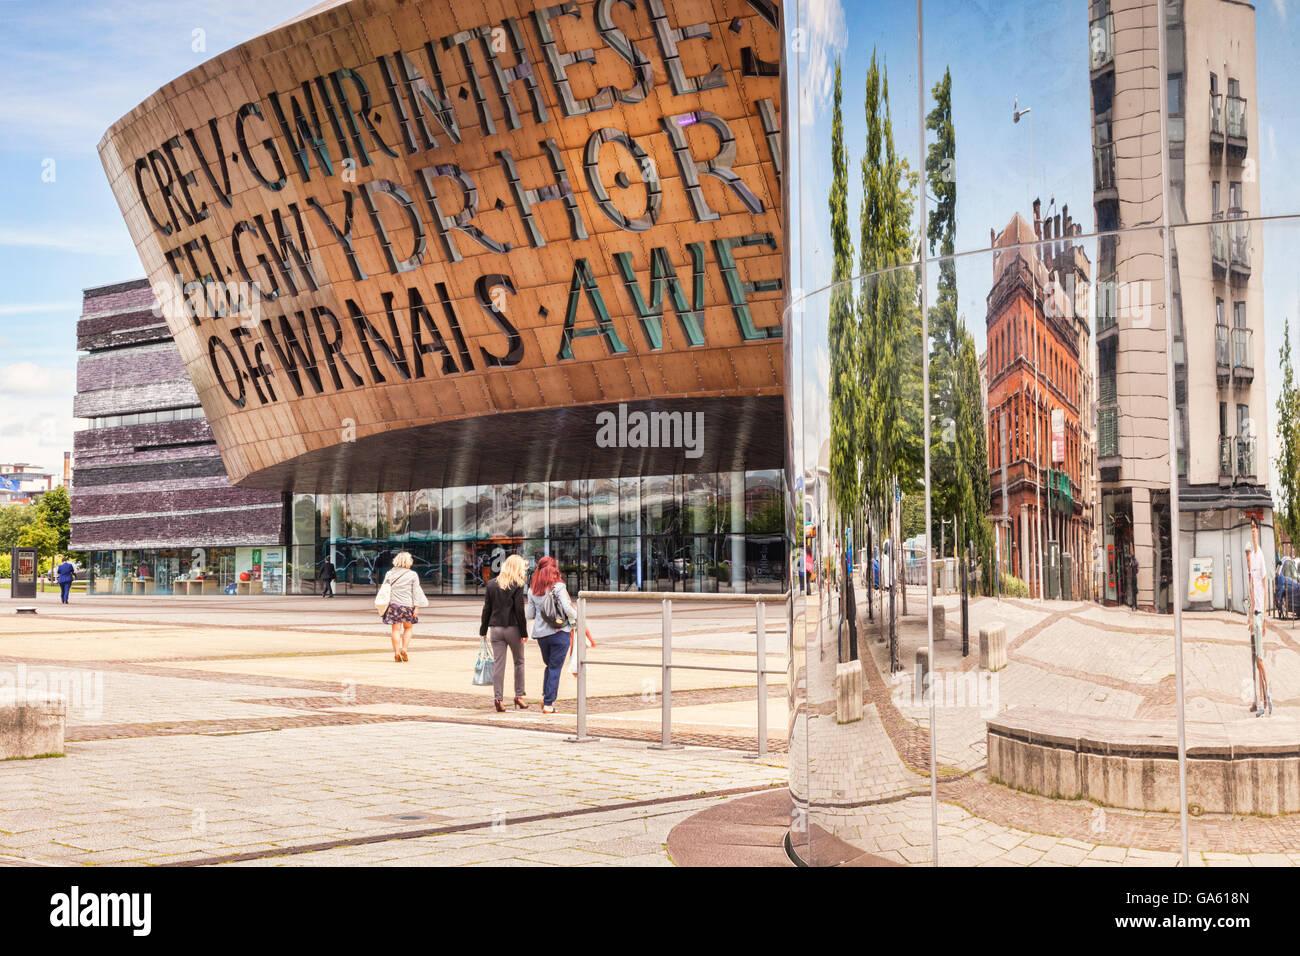 27. Juni 2016: Cardiff, Wales - Roald Dahl Plass mit das Wales Millennium Centre und der Wasserturm, Cardiff, Wales, Stockbild